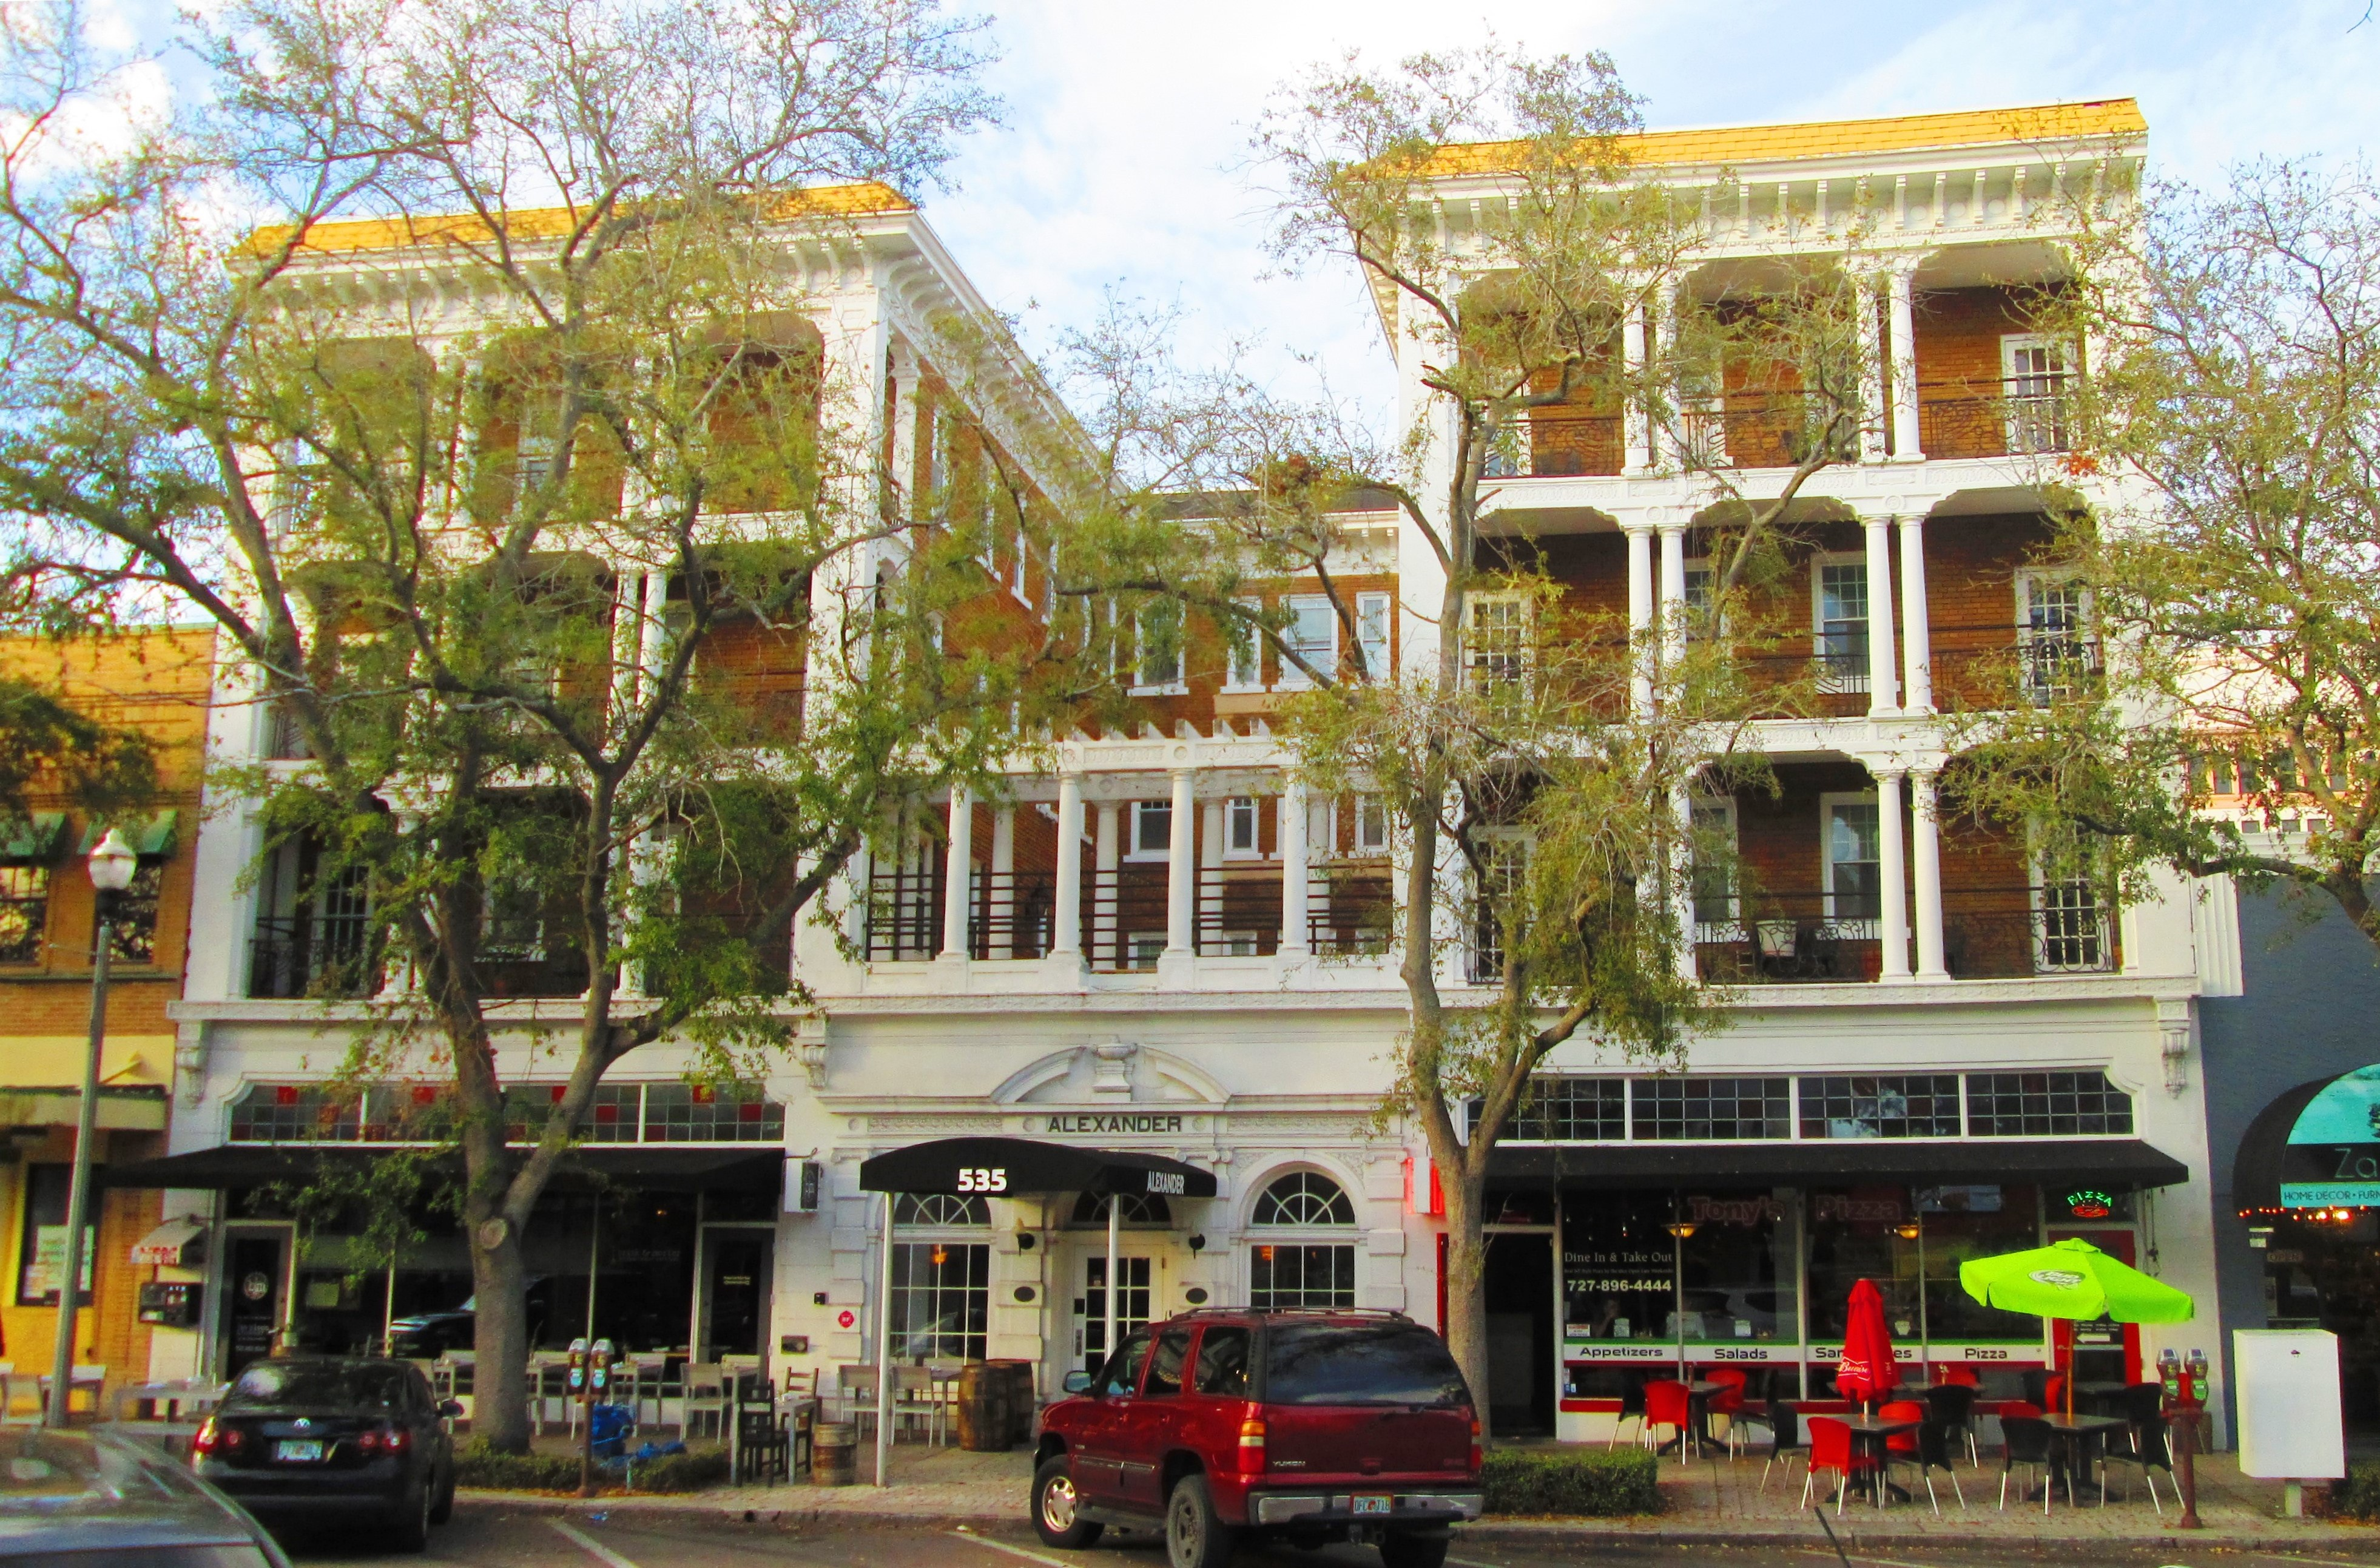 Alexander Hotel 535 Central Avenue St Petersburg Florida Jpg